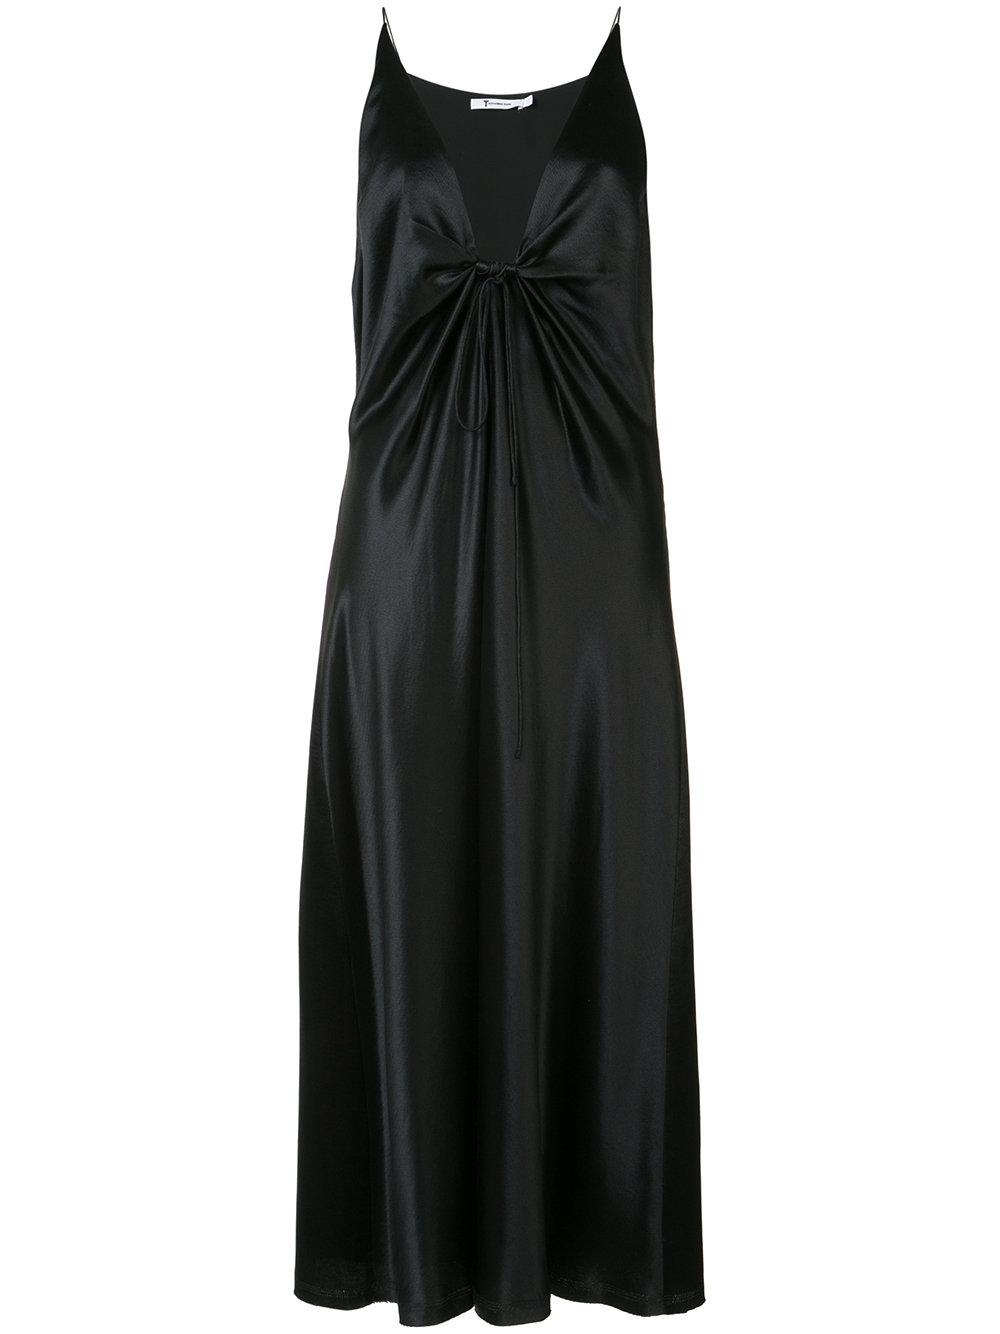 T BY ALEXANDER WANG strappy plunge dress, 32089₽ (-10% на первый заказ | f10off)